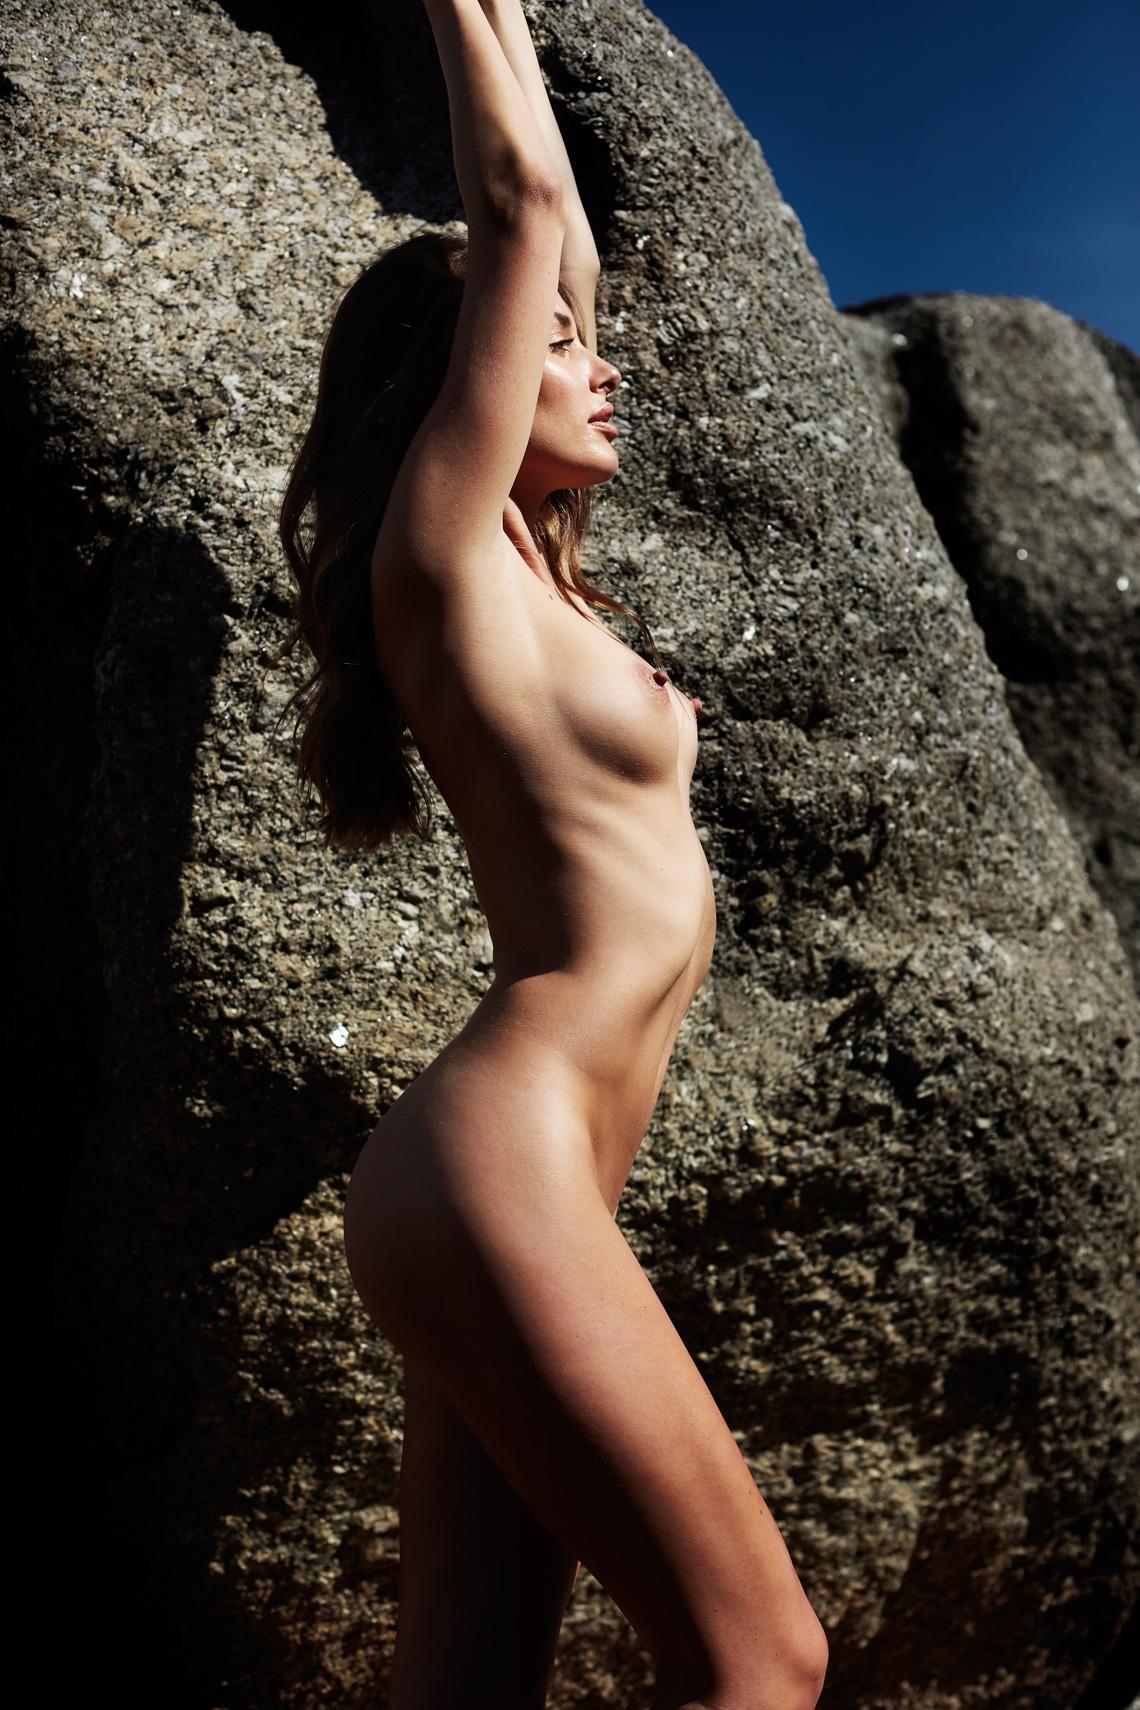 dominique-lamon-vaughan-treyvellan-yume-2016-nude-08